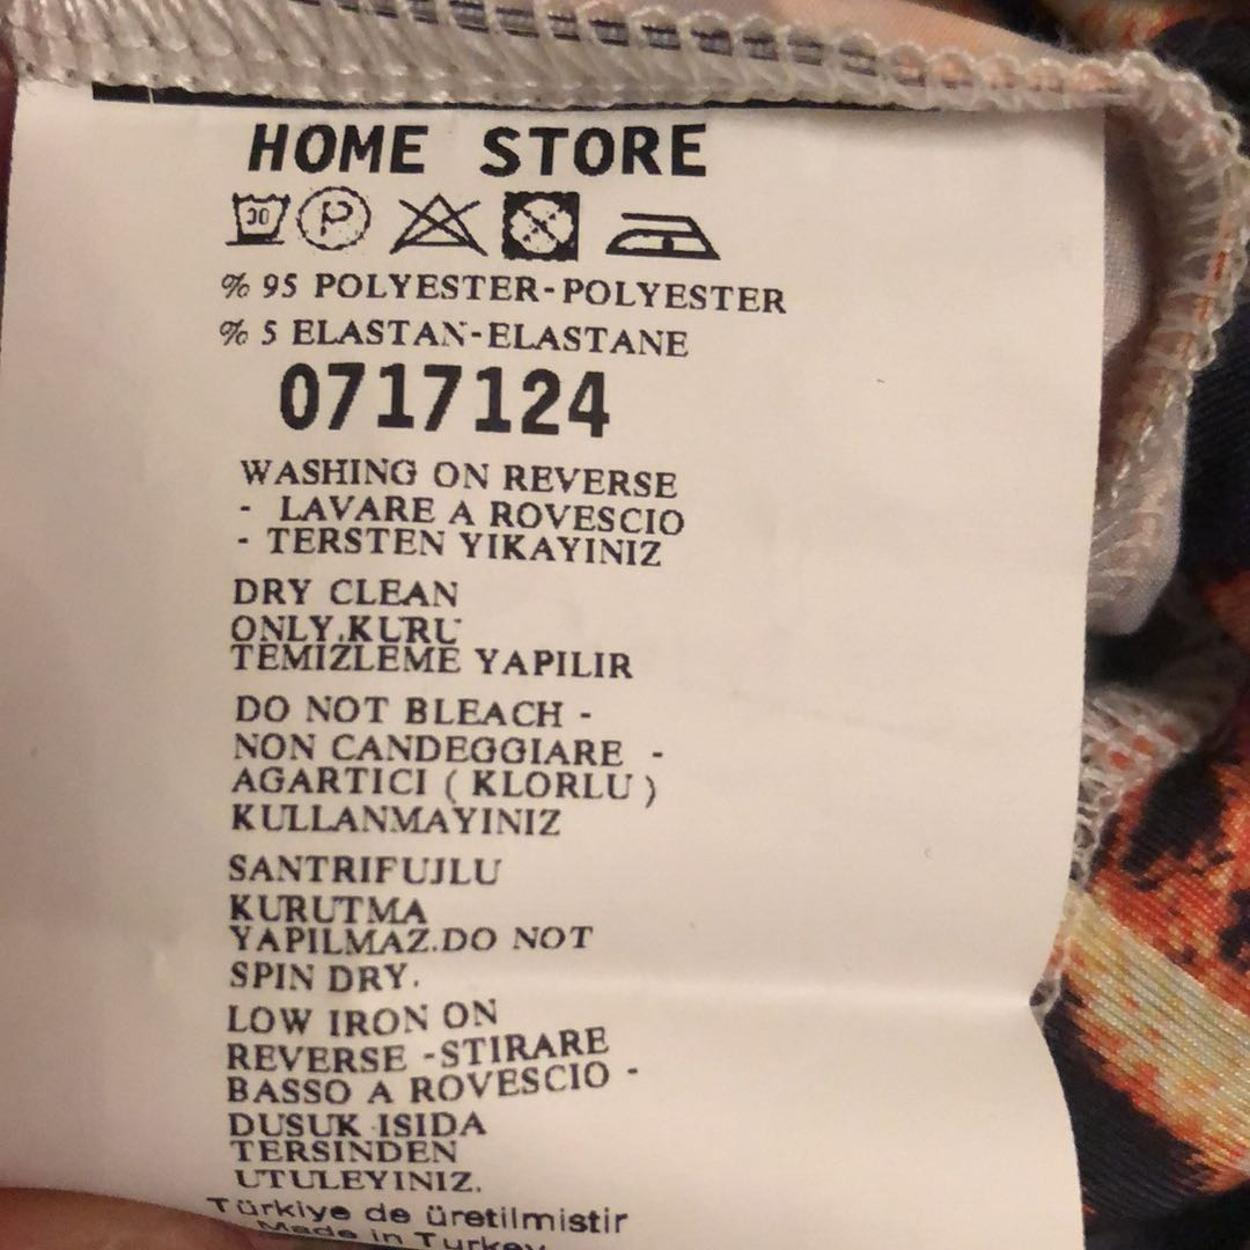 Home Store Bluz